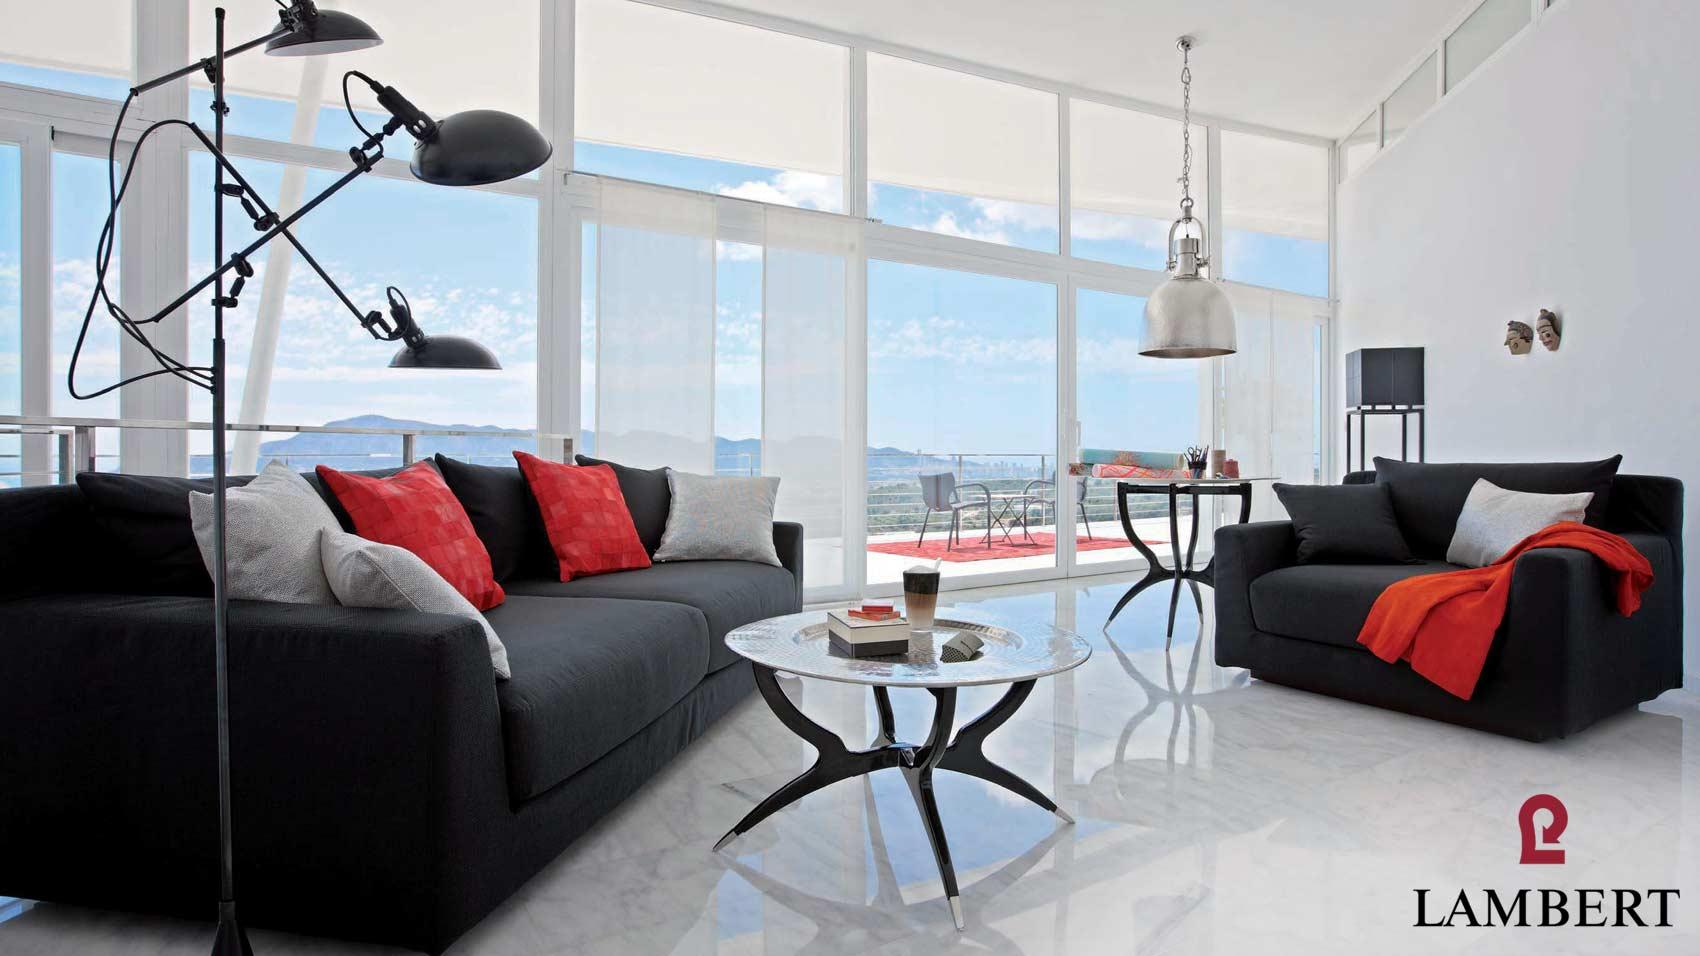 Möbel Jena wohnaccessoires wohndeko nahe erfurt jena weimar möbel u küchen